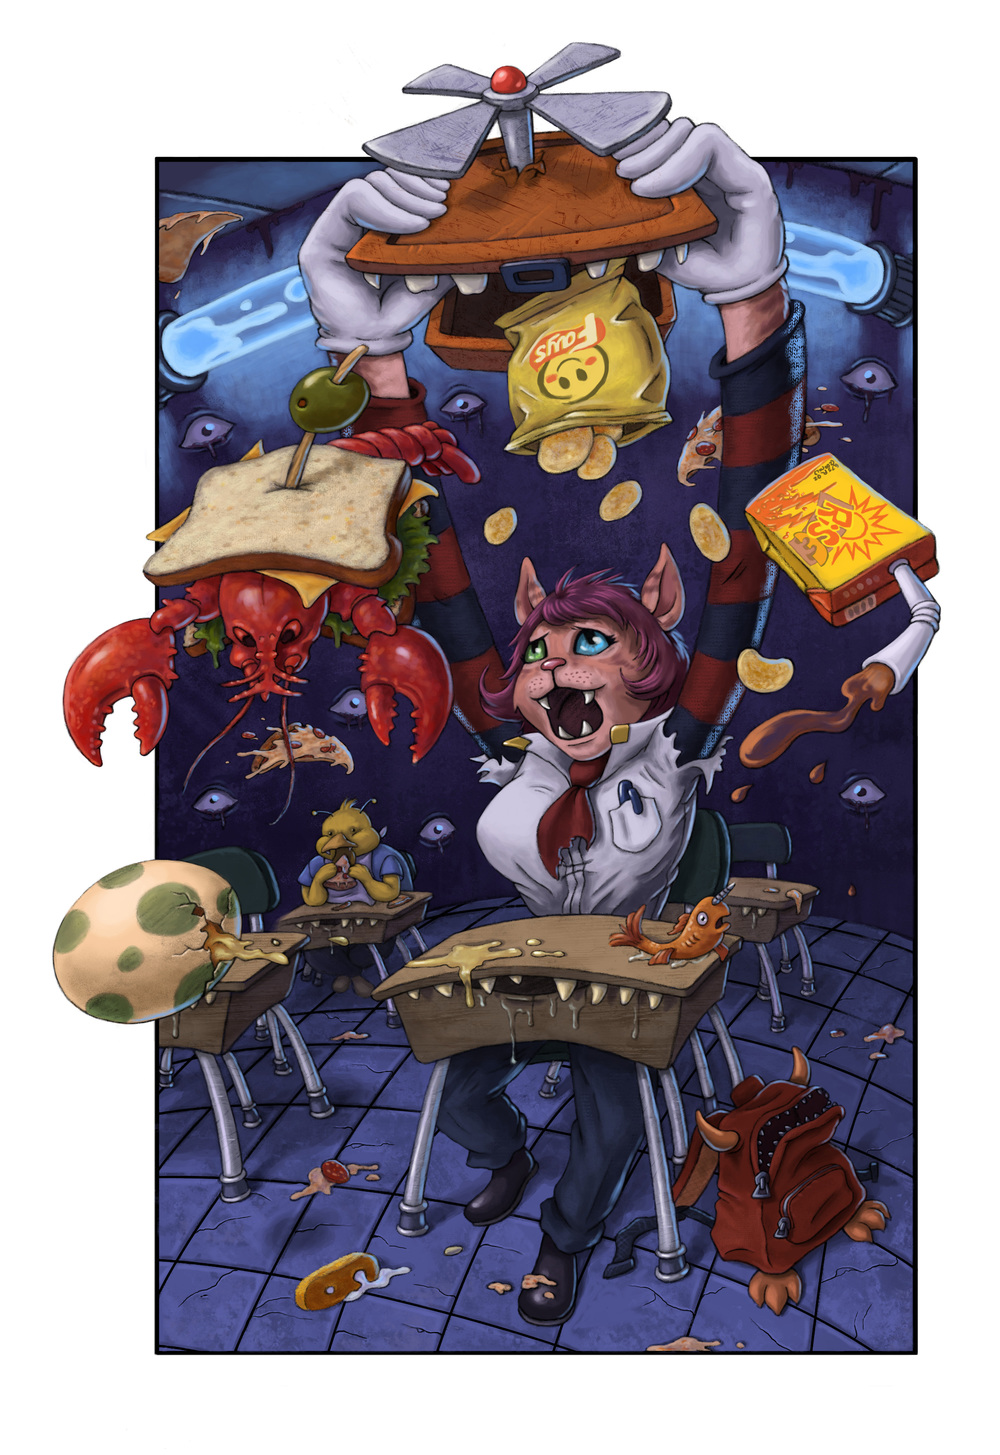 Odd School Series (scene 2)